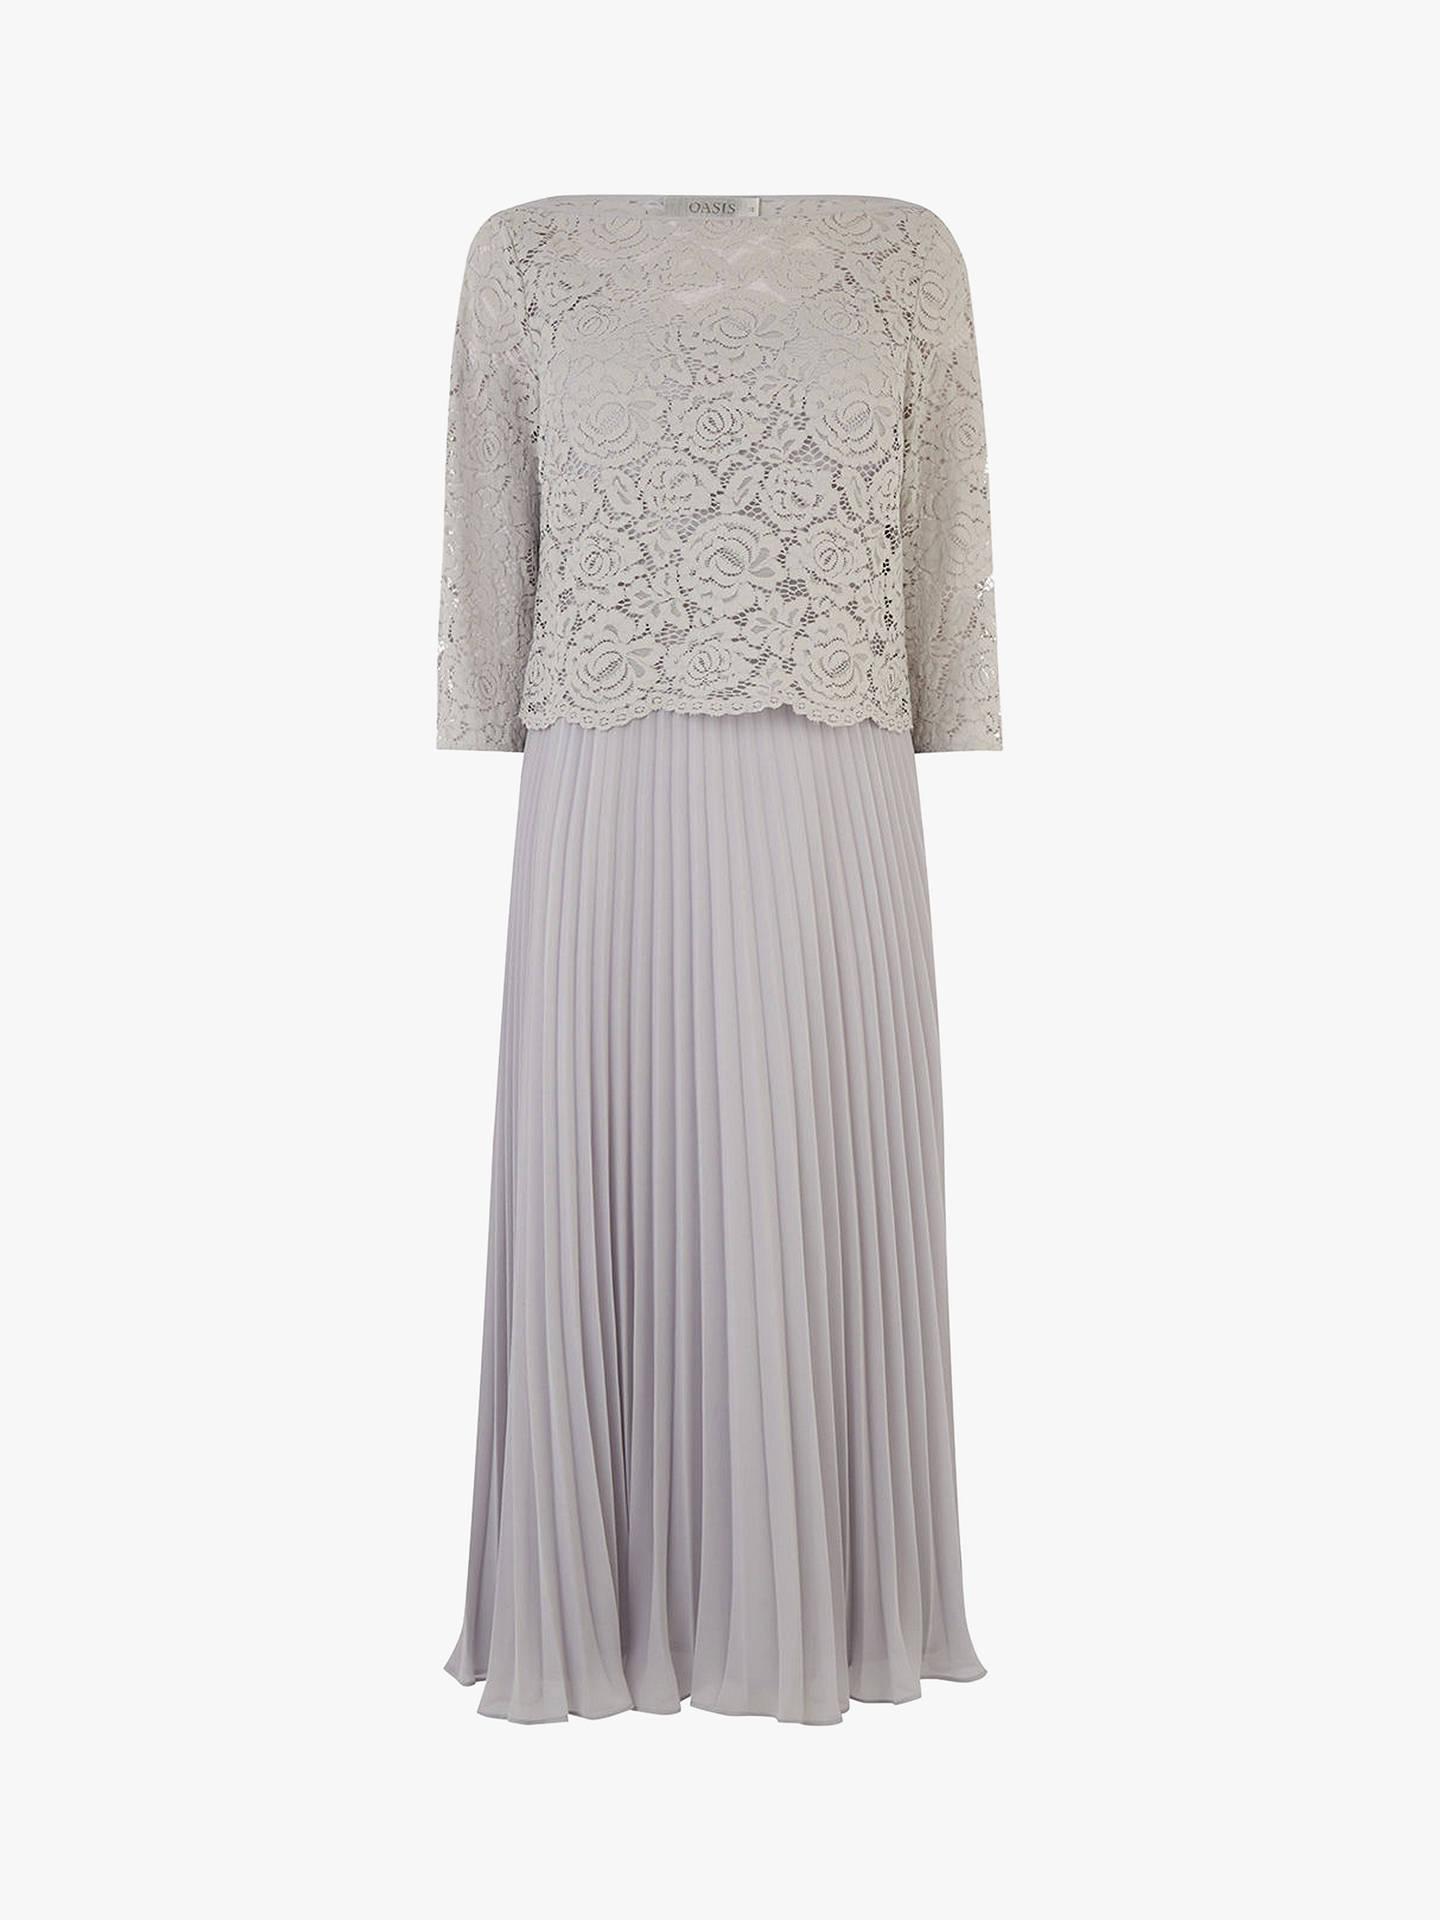 a3f91022fdff ... Buy Oasis Lace Top Midi Dress, Pale Grey, 12L Online at johnlewis.com